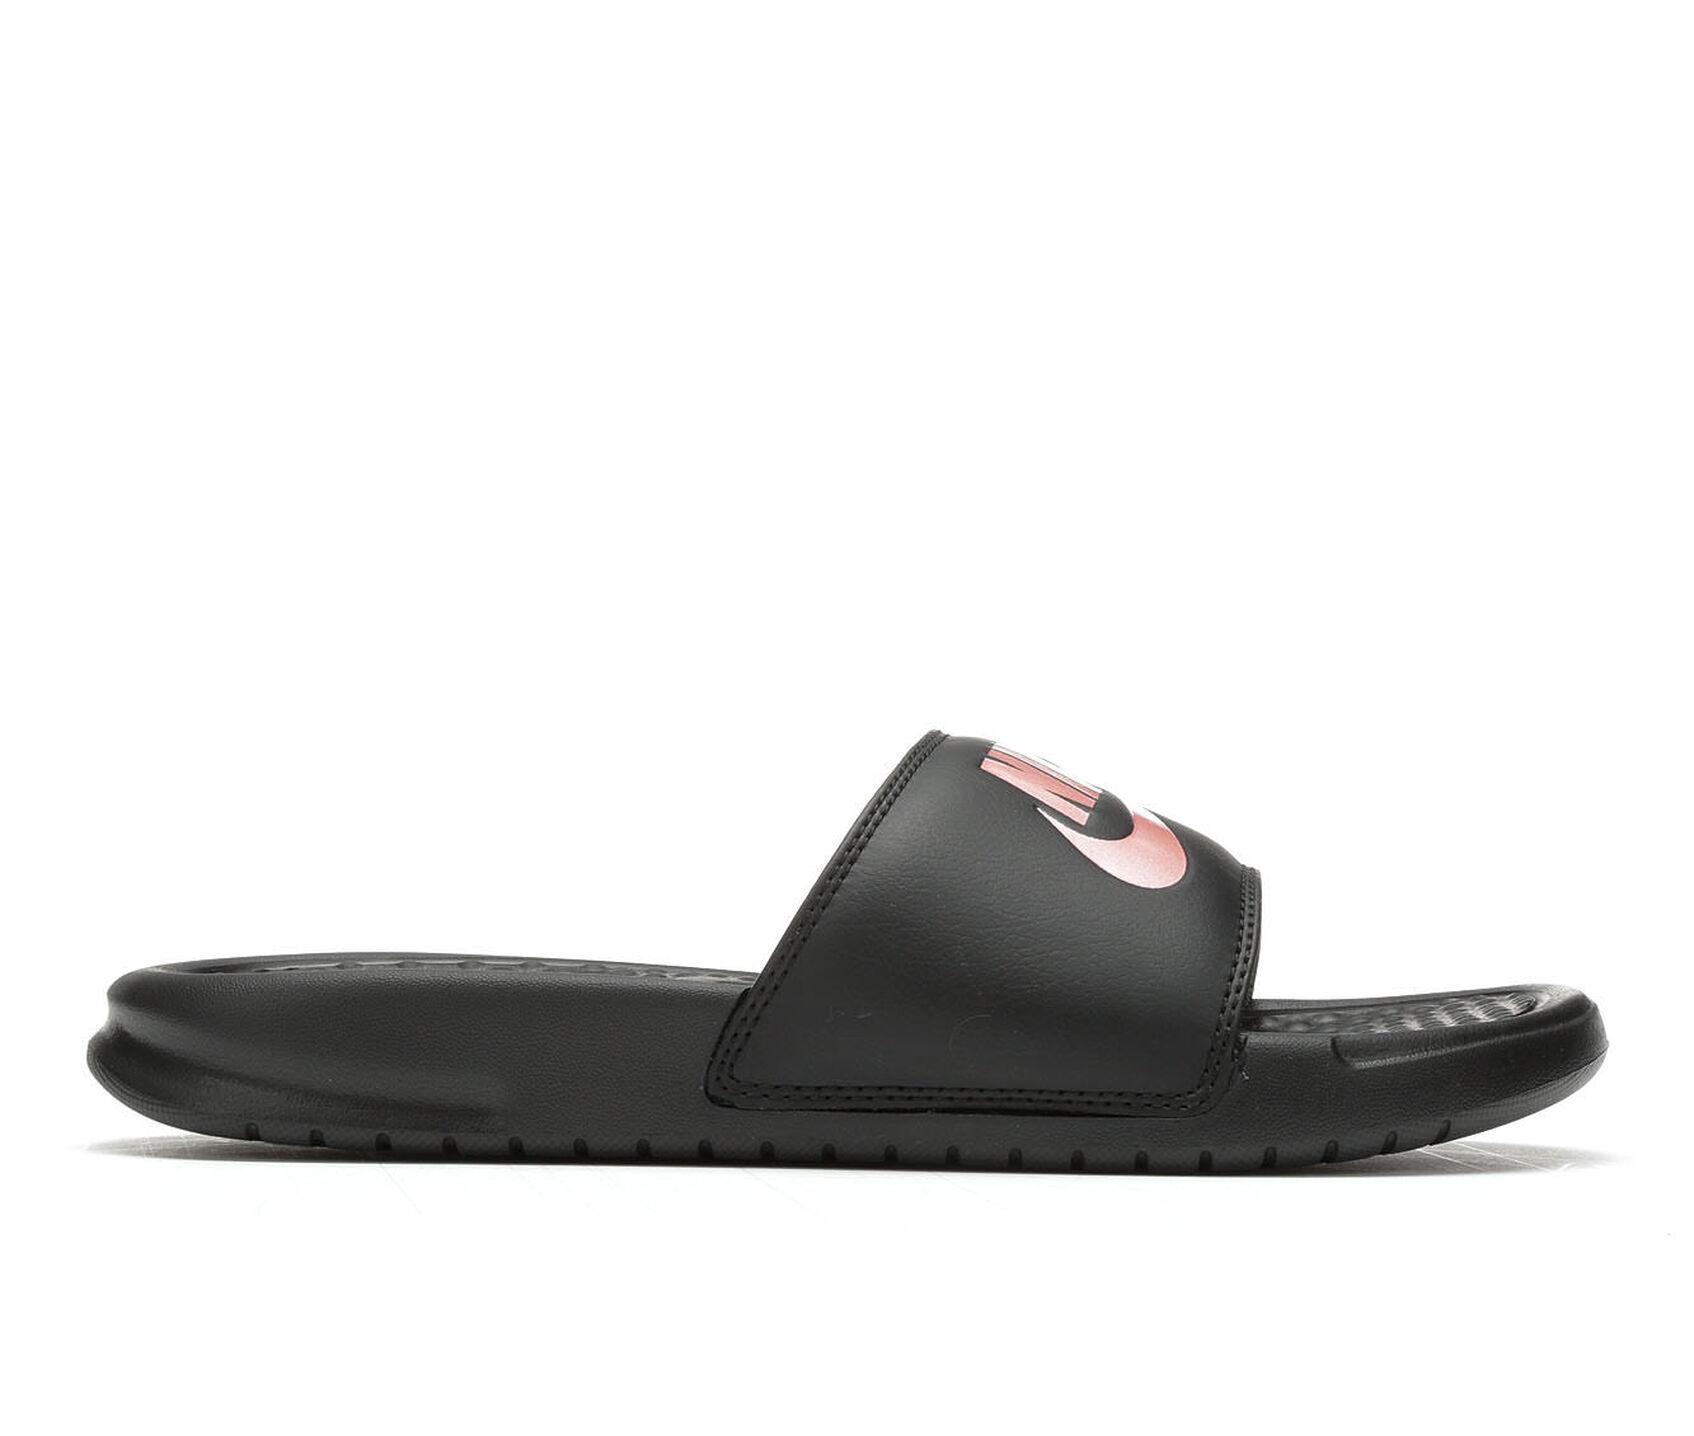 f12f01b40562 ... Nike Benassi JDI Slide Sandals. Previous